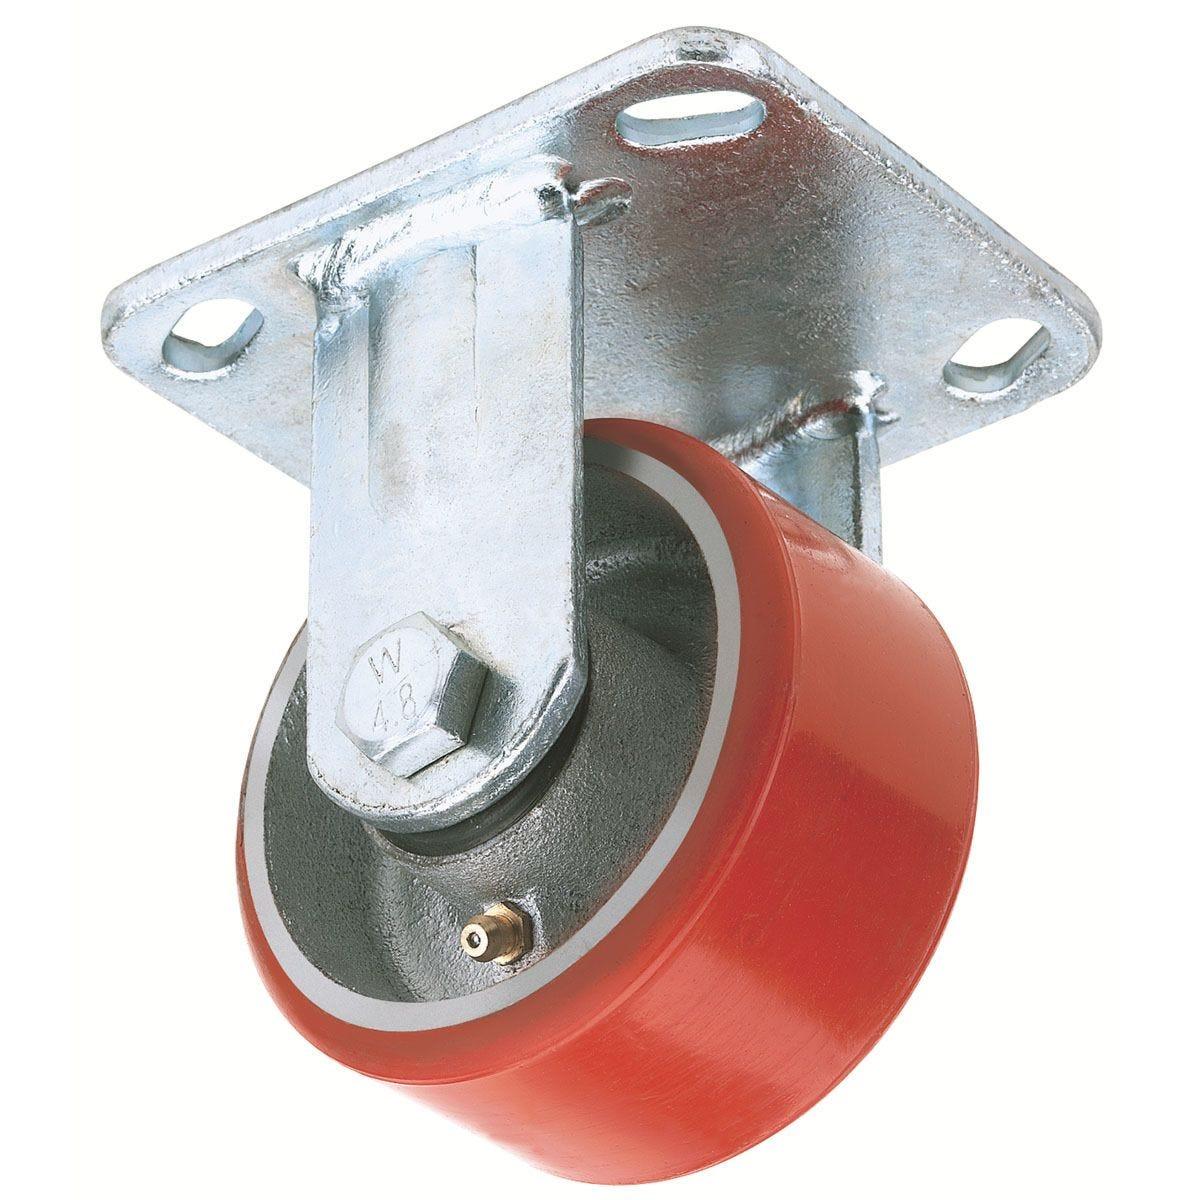 Draper 100mm Diameter Fixed Plate Fi x Ing Heavy Duty Polyurethane Wheel - S.W.L. 250Kg